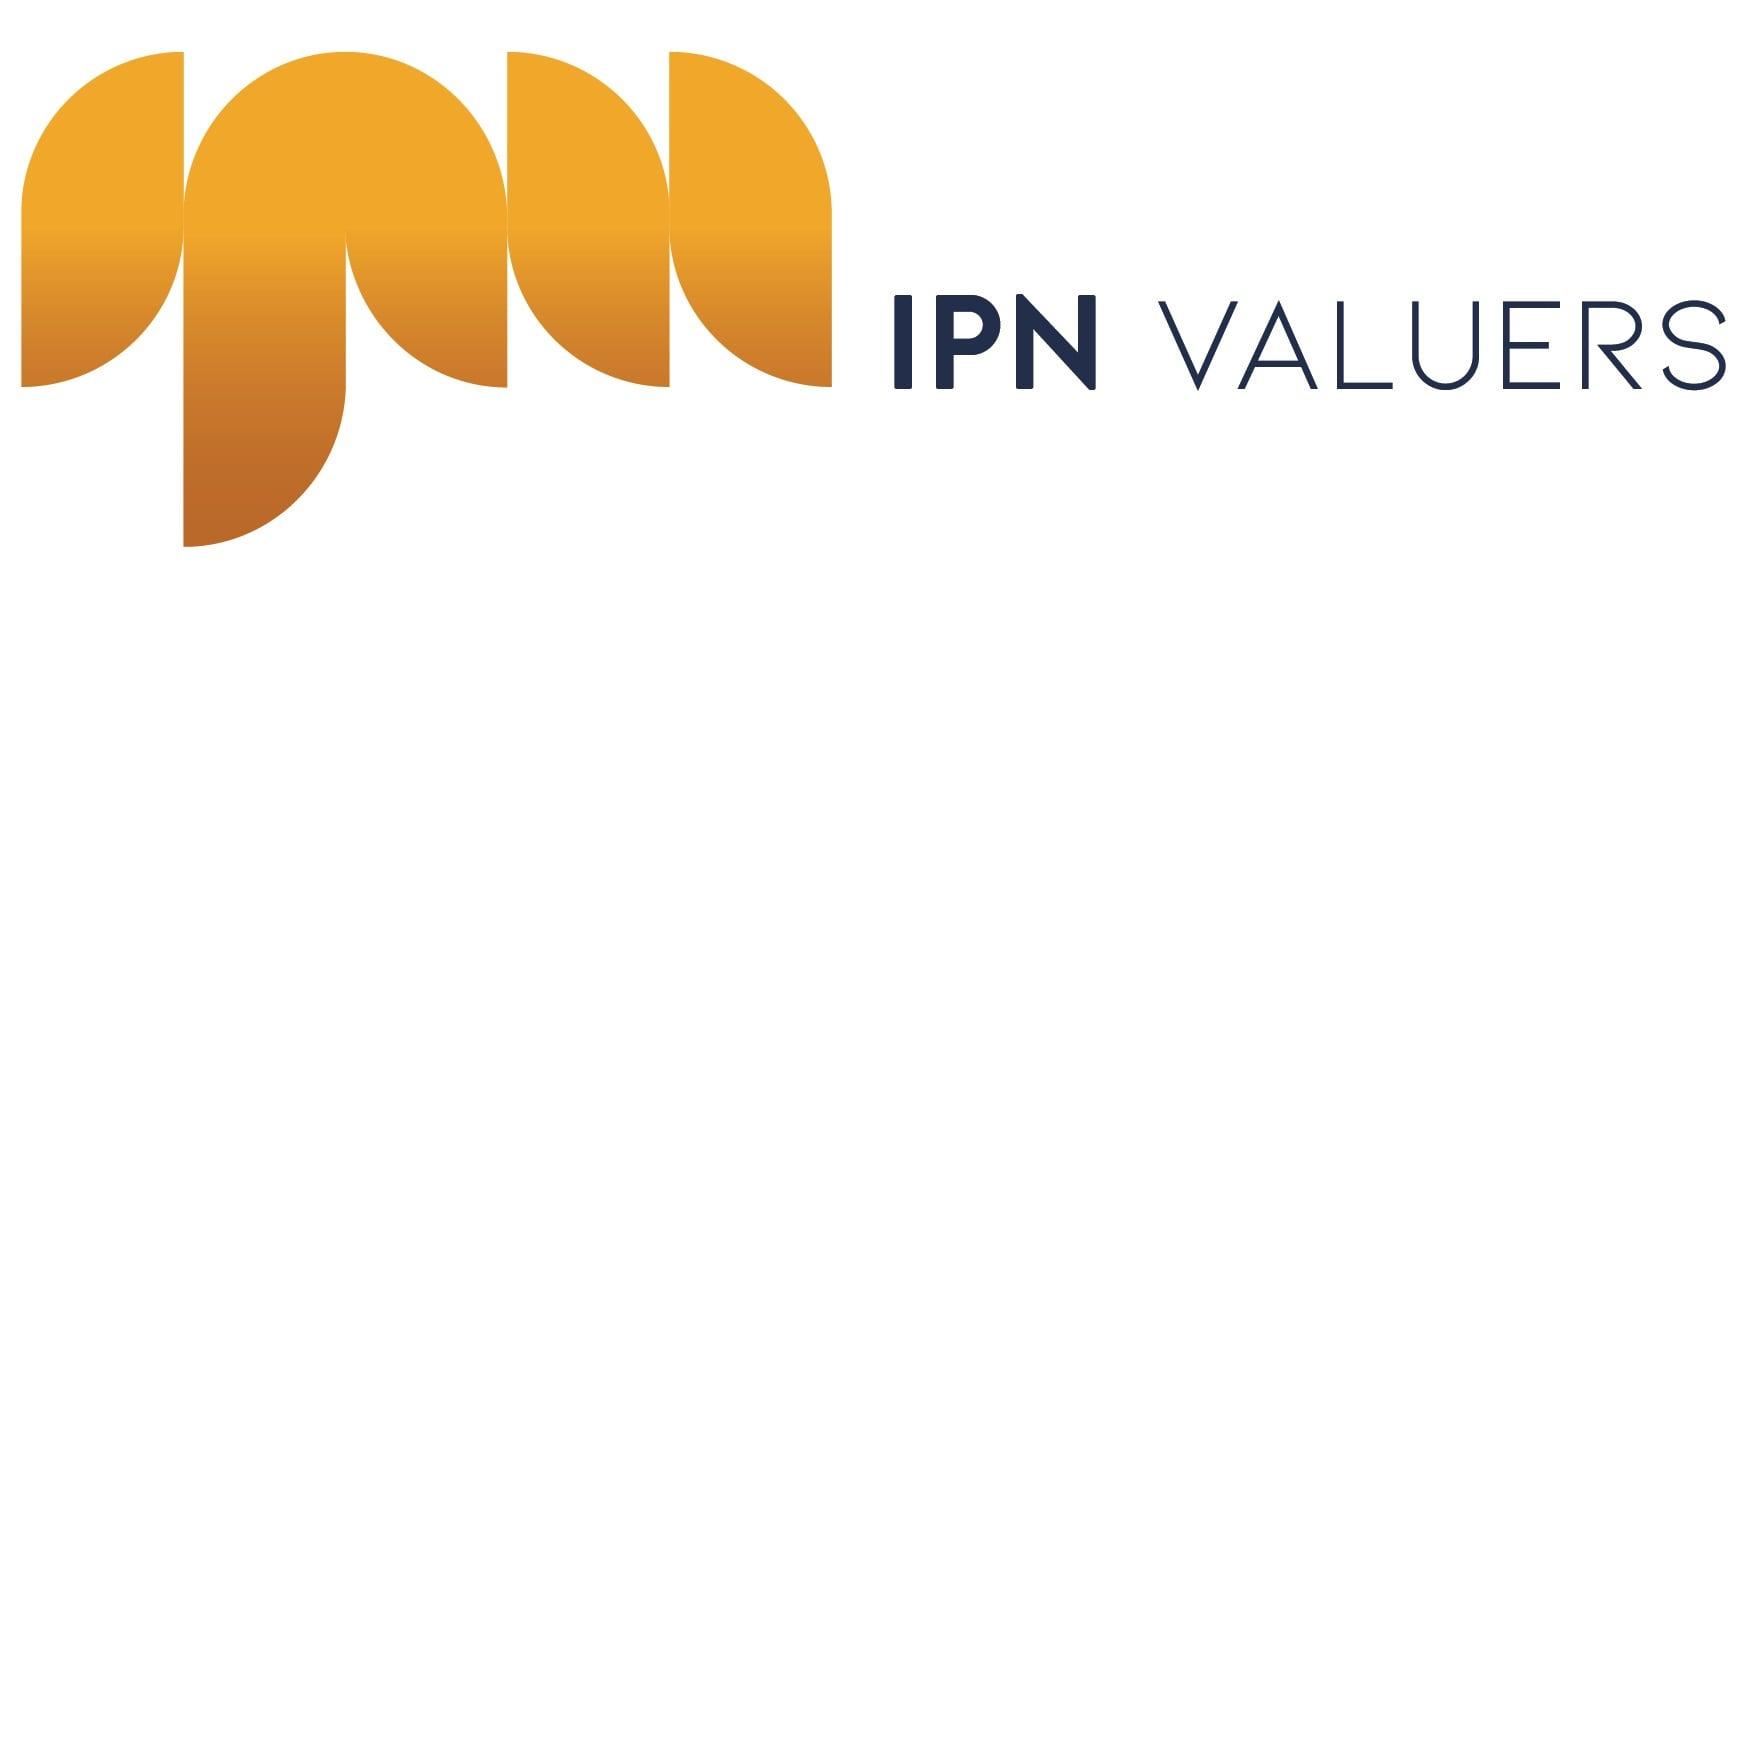 IPN Valuers Ballarat - Property Valuers - 17 Armstrong St S